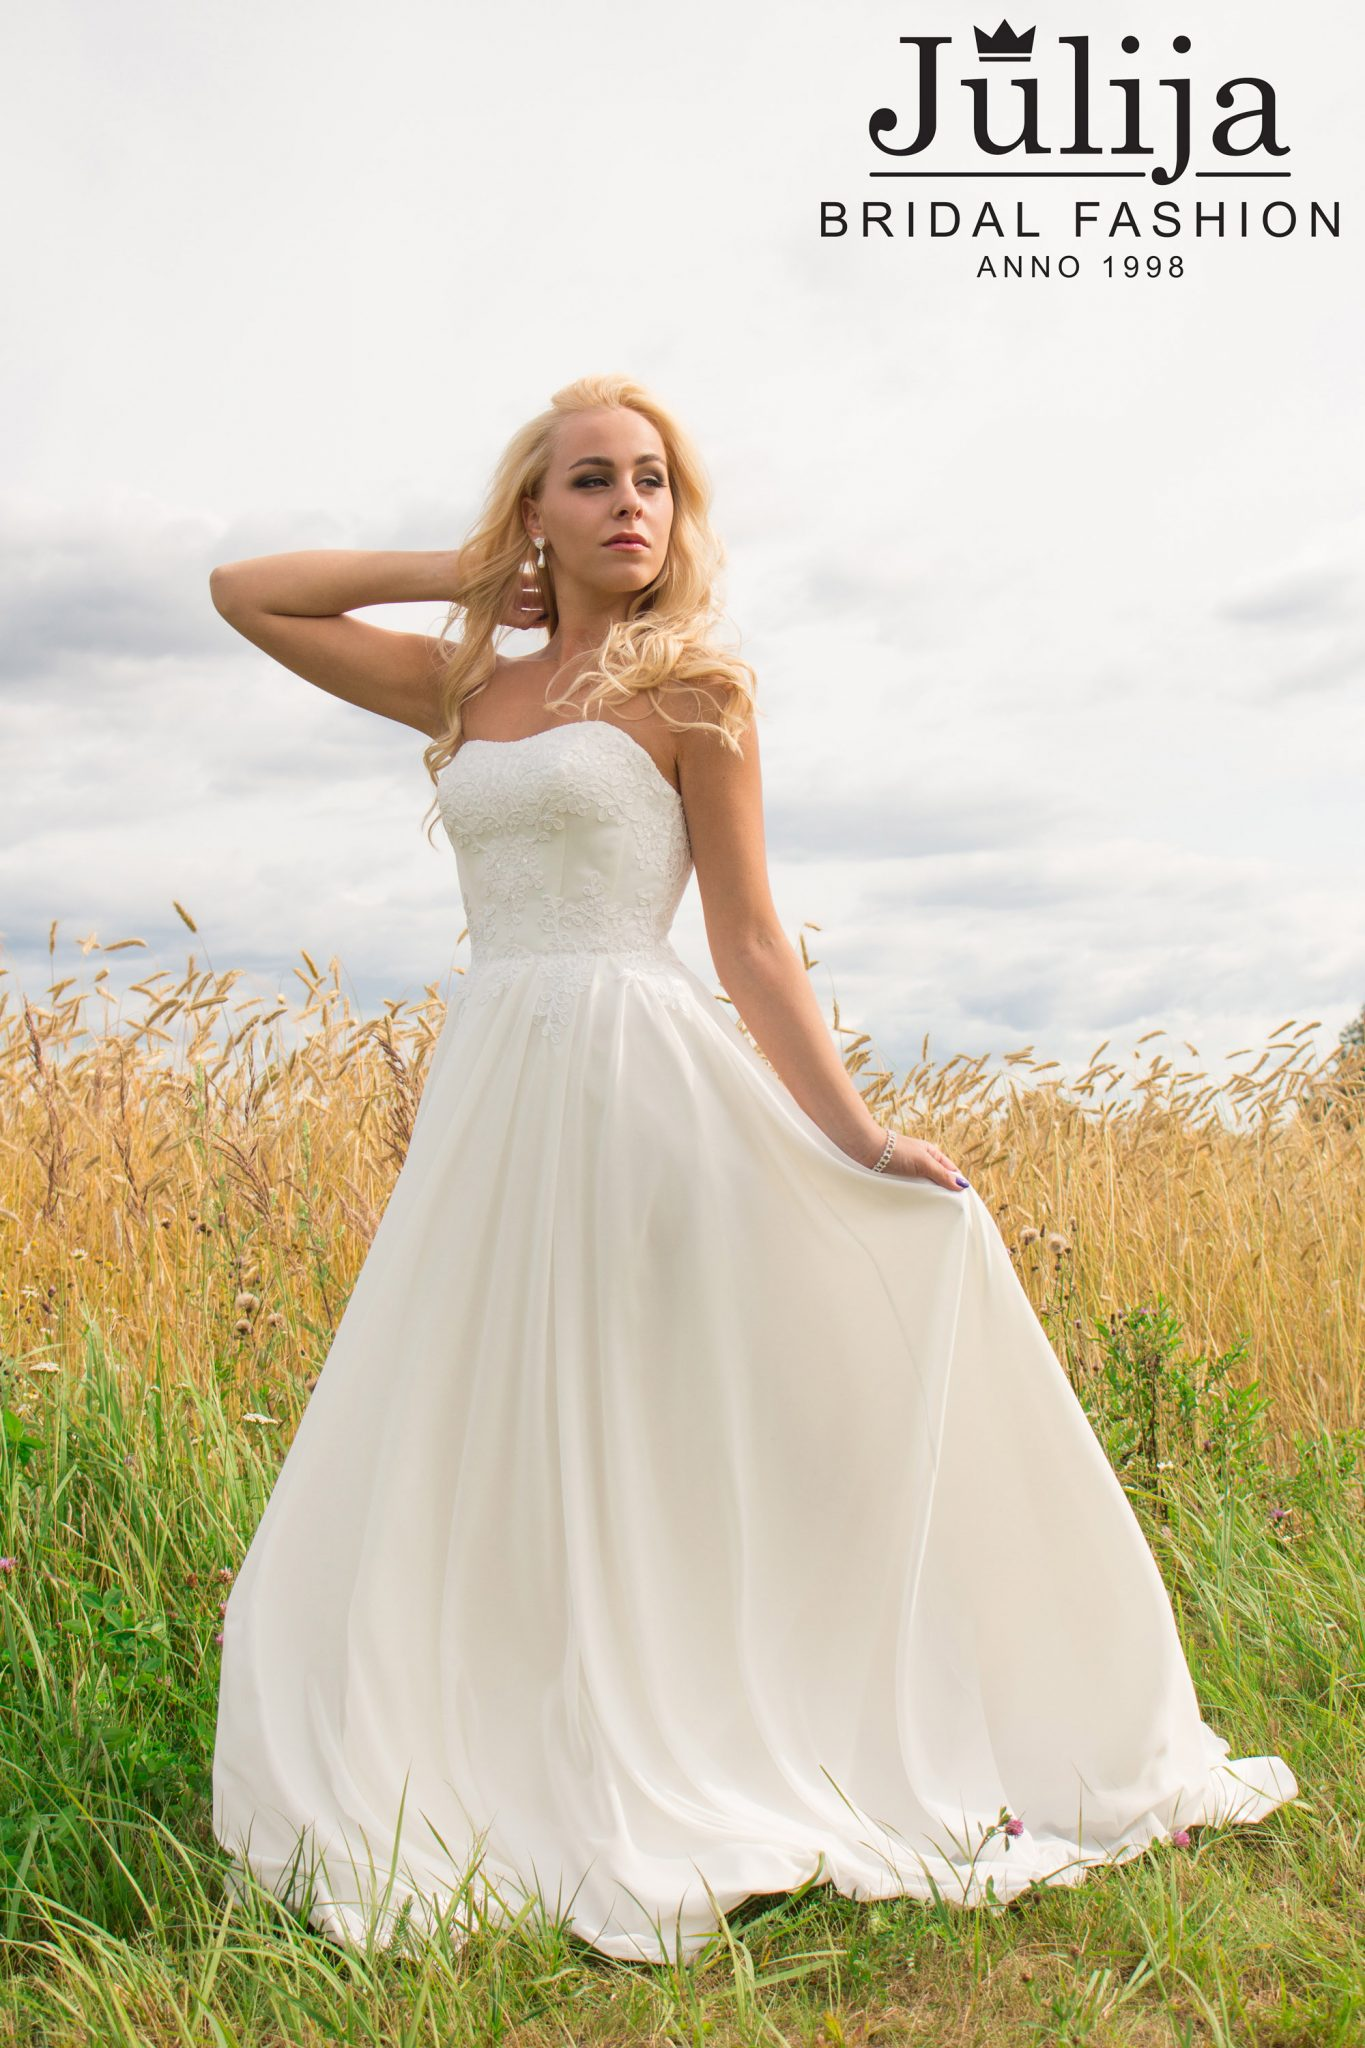 Hawaii | Bridal, wedding dresses designer - Julija Bridal Fashion